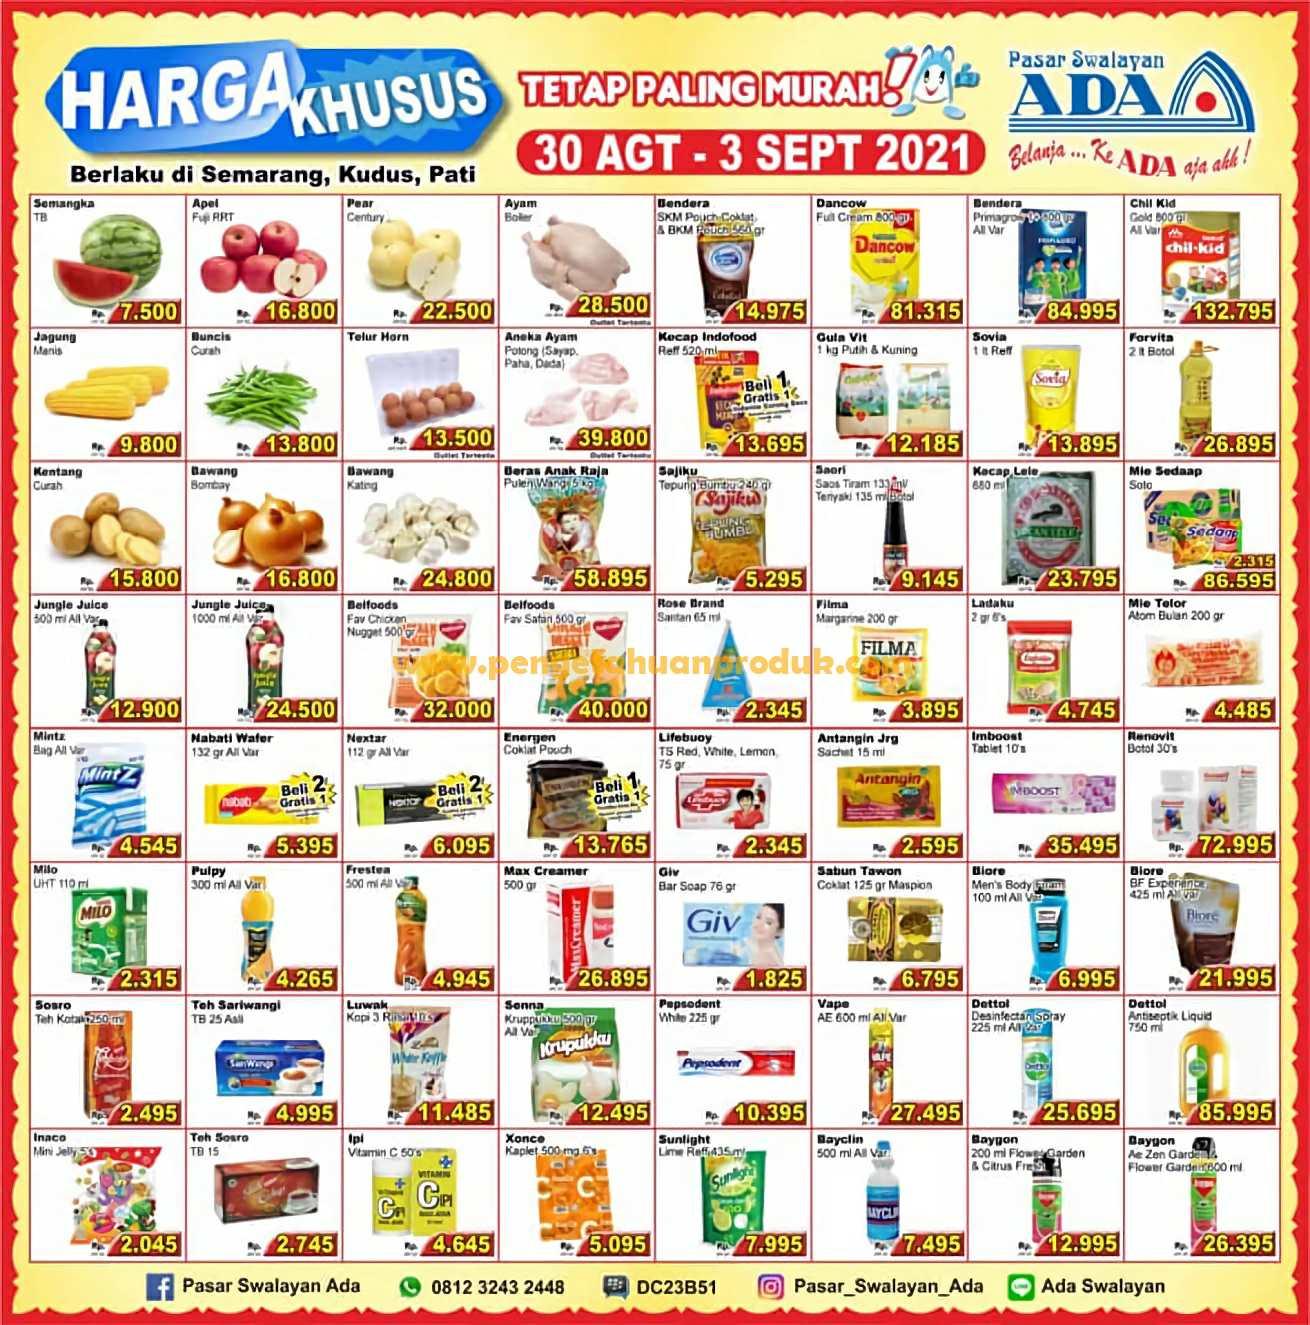 Katalog ADA Swalayan Promo Harga Khusus 30 Agustus - 3 September 2021